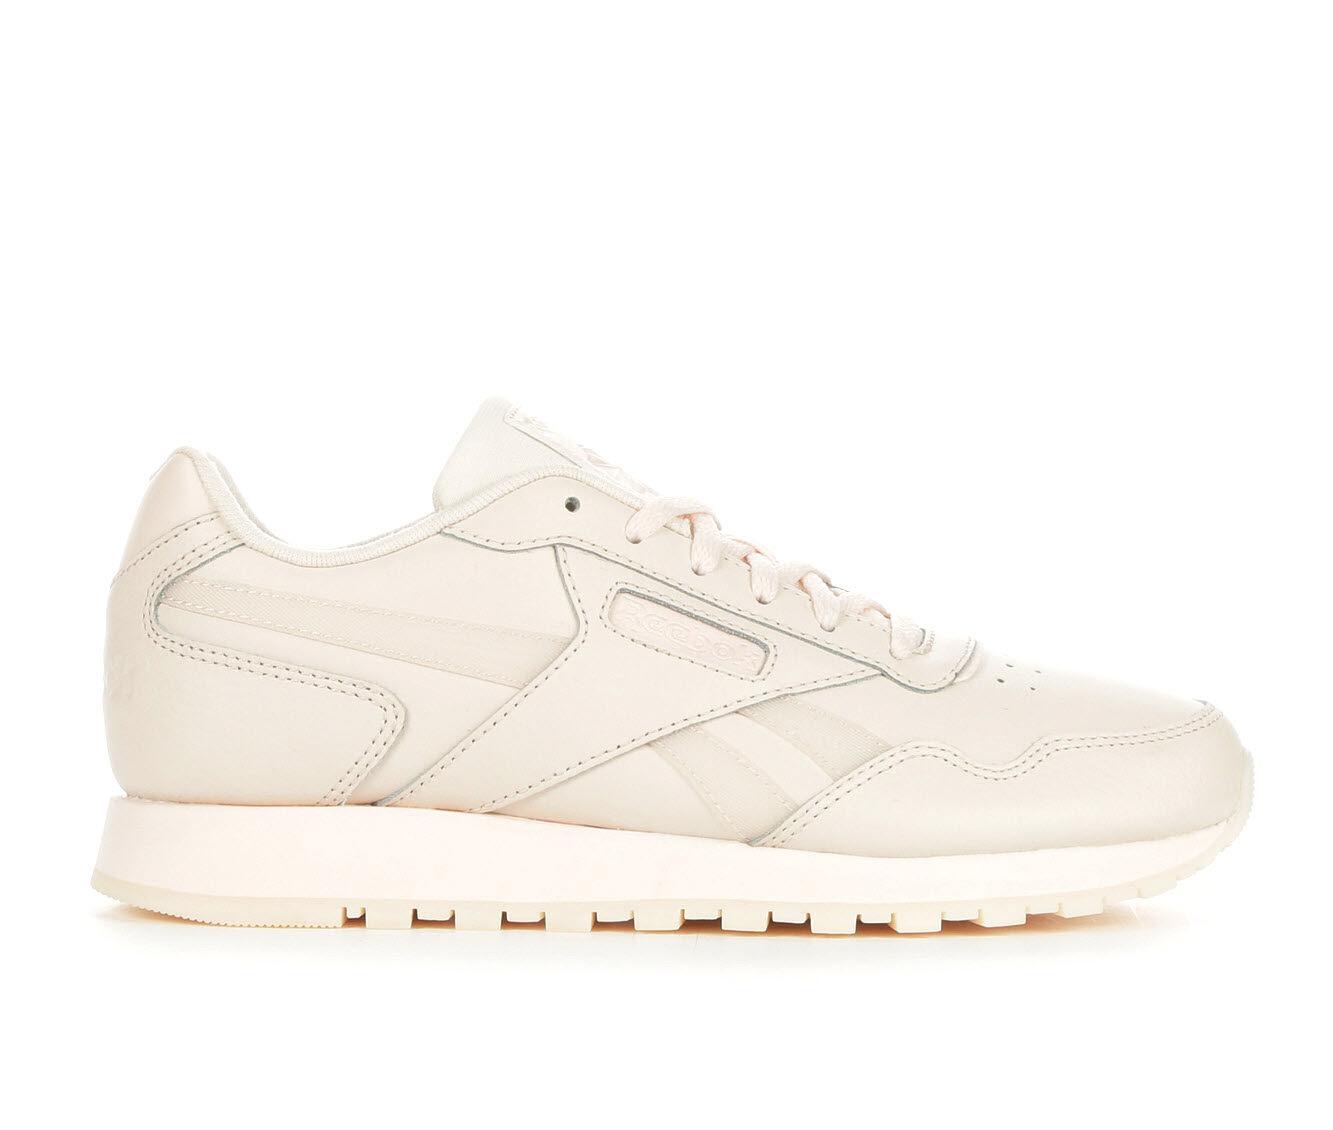 Women's Reebok Classic Harman Run Retro Sneakers Pale Pink/Ice